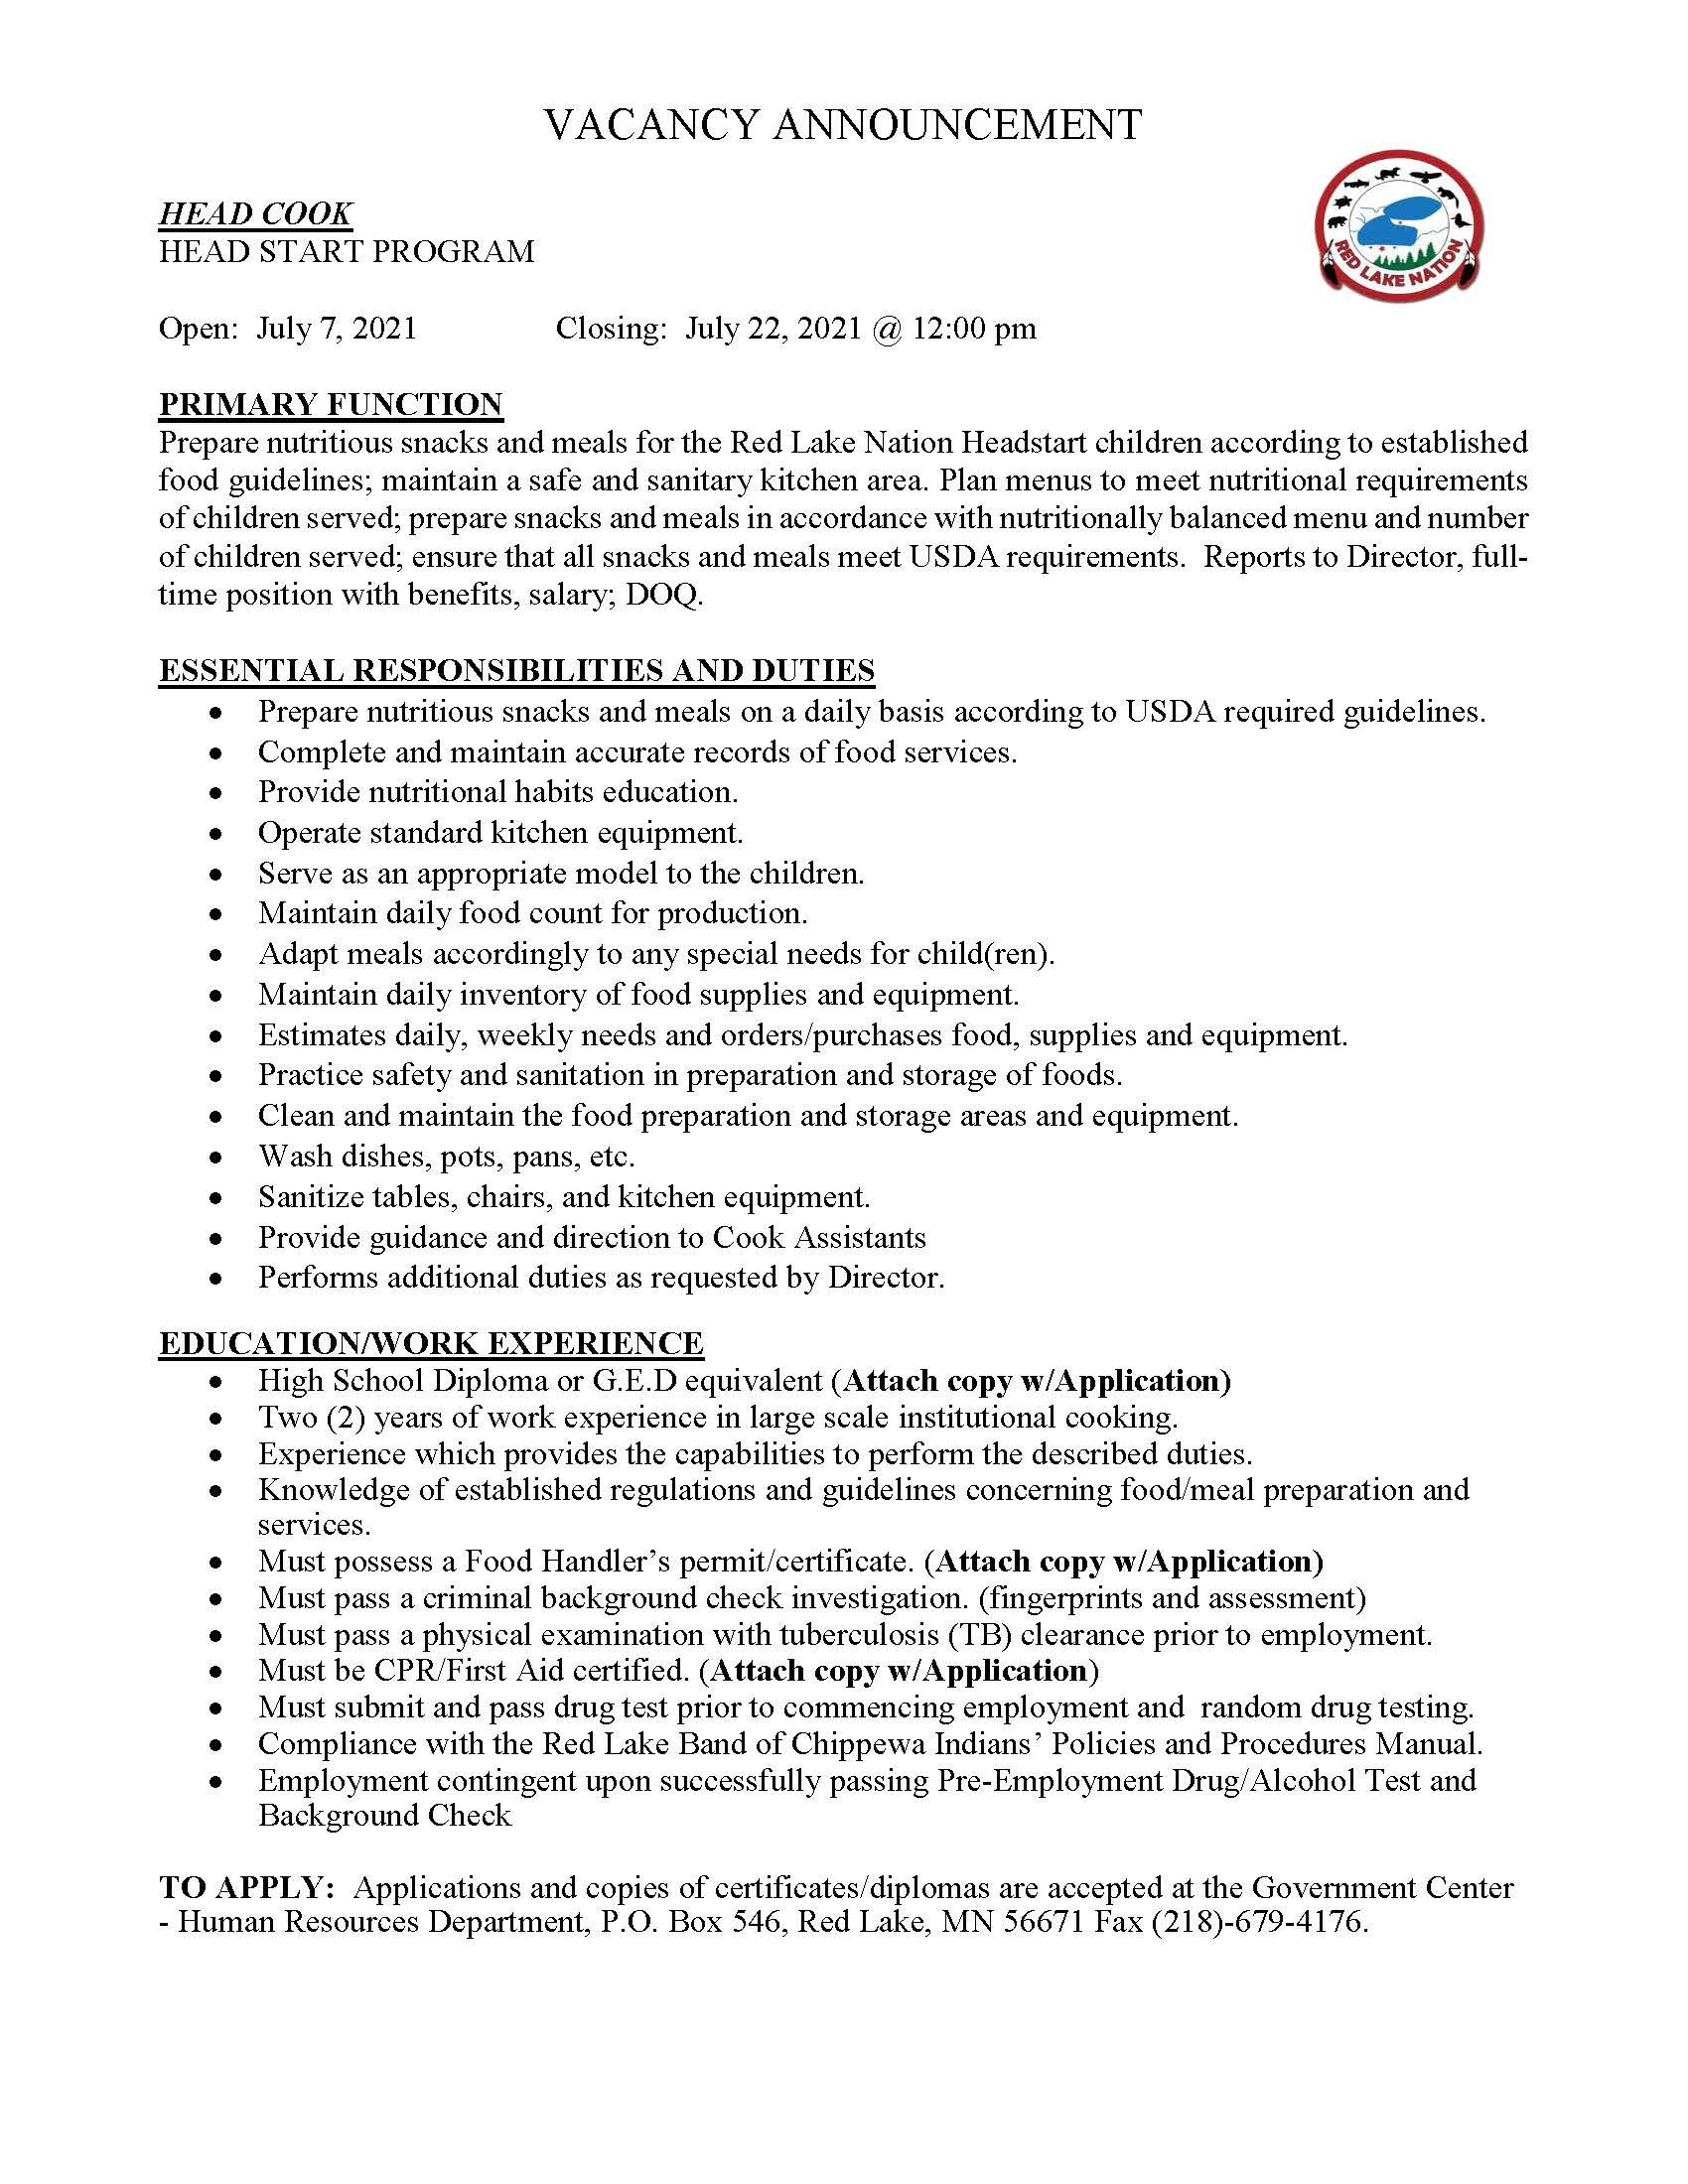 Head Cook-Head Start Program-Job posting-7-9-2021